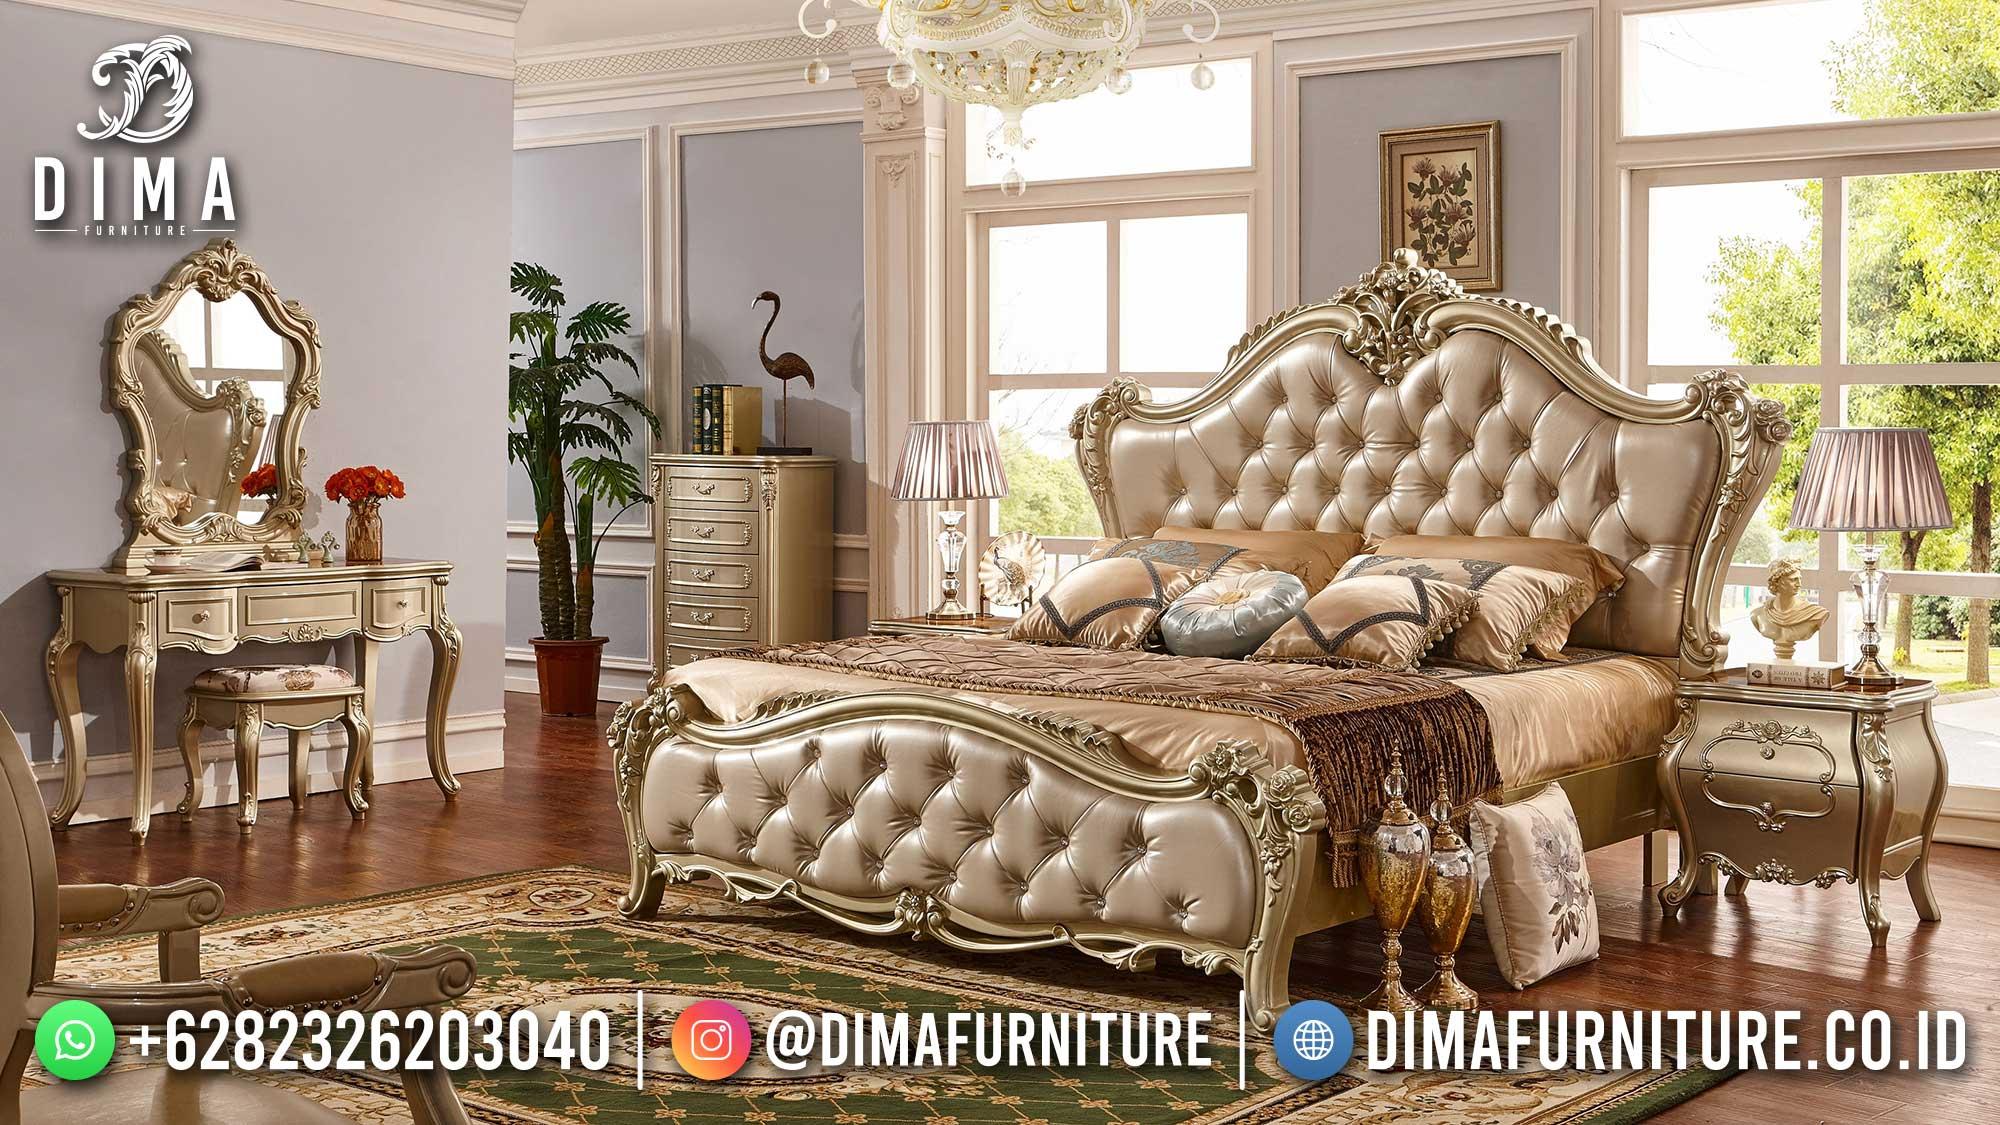 Greatest Style Tempat Tidur Mewah Ukir Luxury Golden Duco Color ST-1410